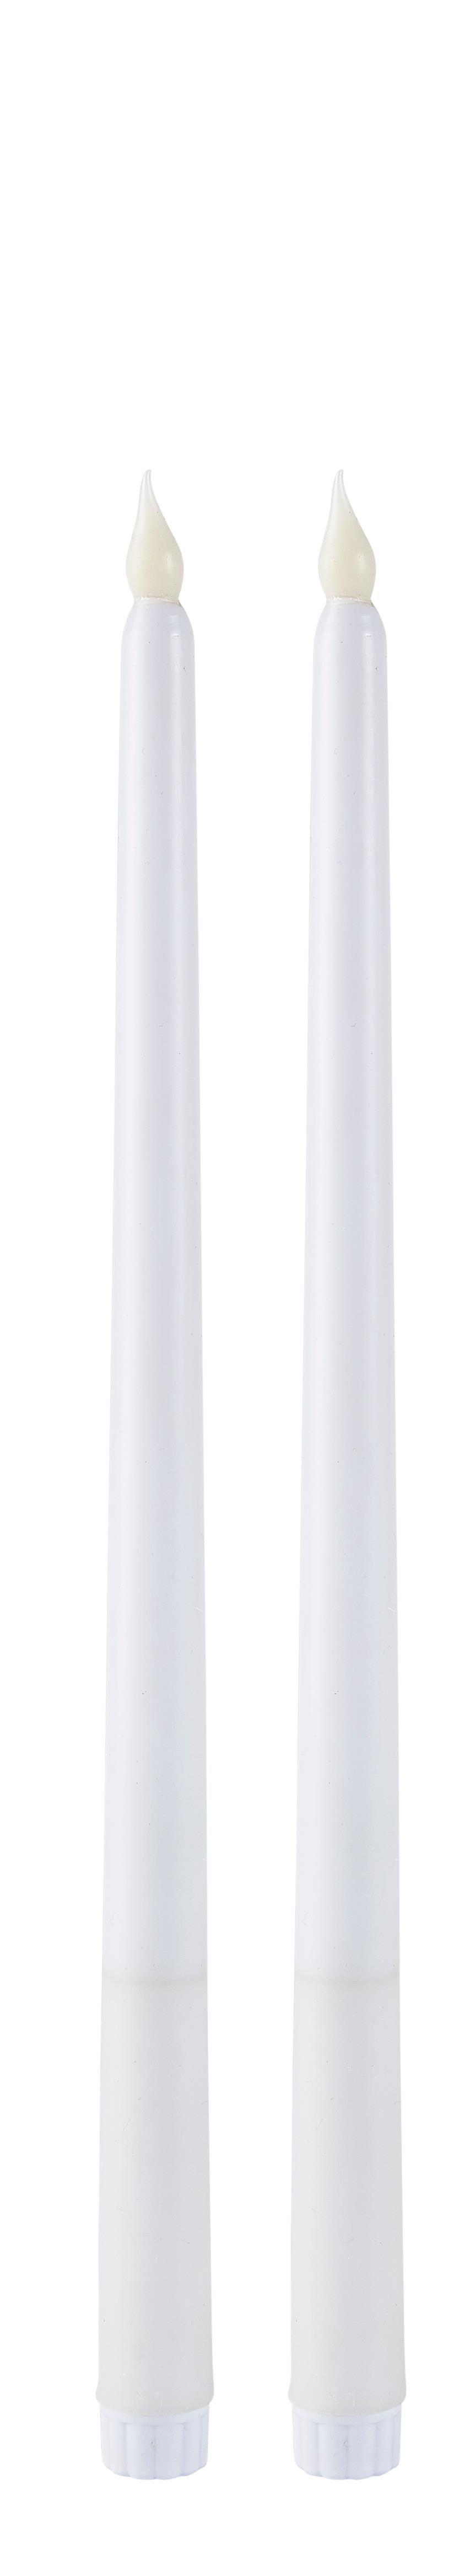 Image of   Villa Collection LED stagelys m/timer 2 st PP Paraffin Vit D 2 cm